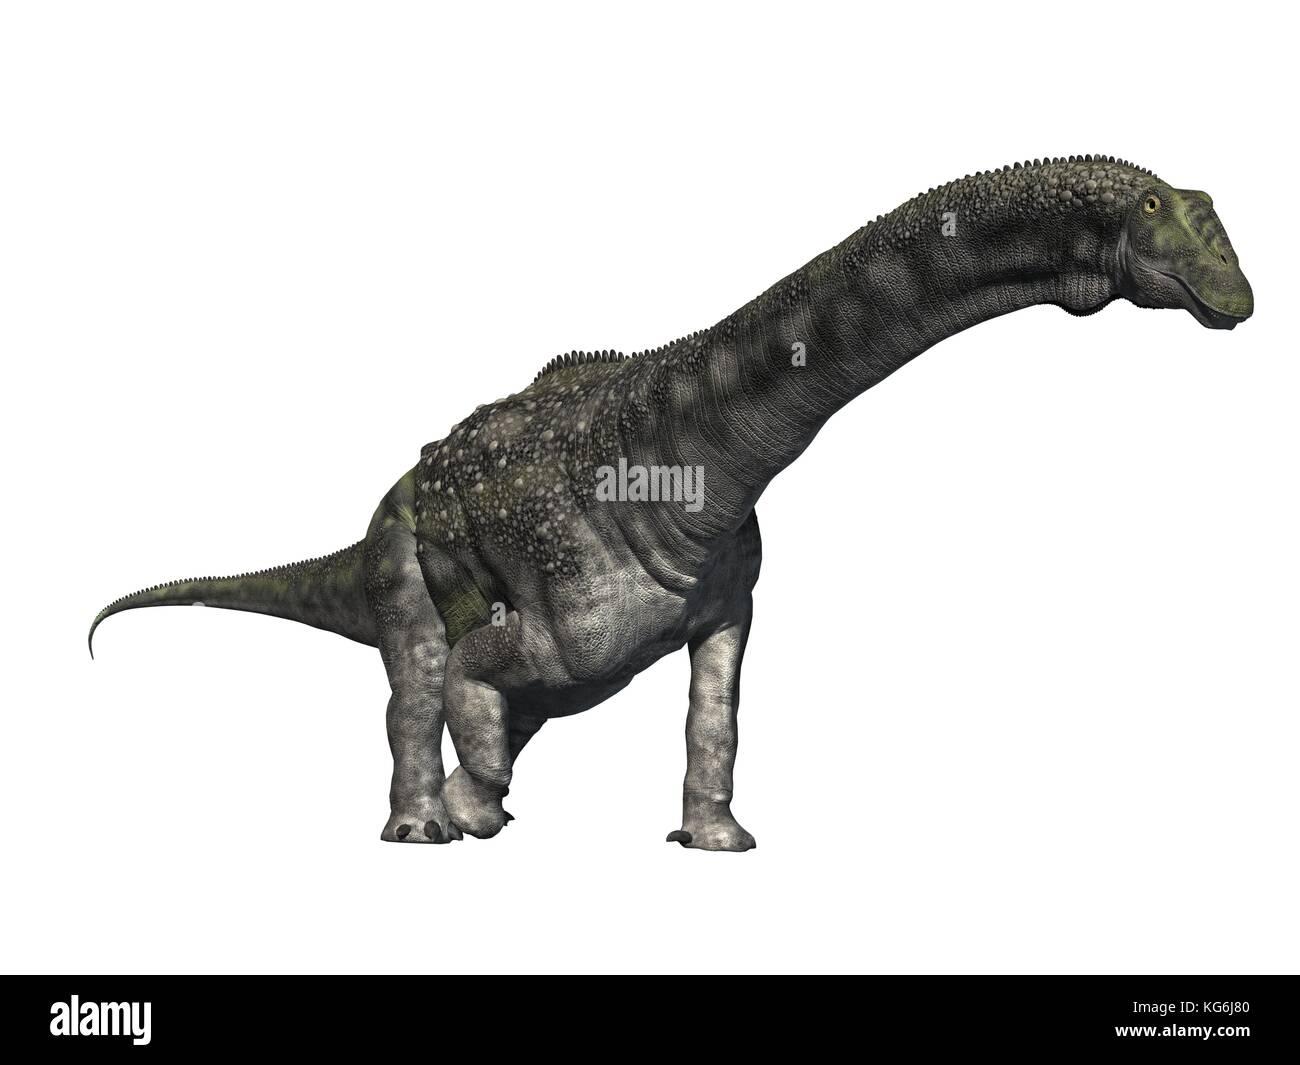 original 3D render of Dinosaur Stock Photo